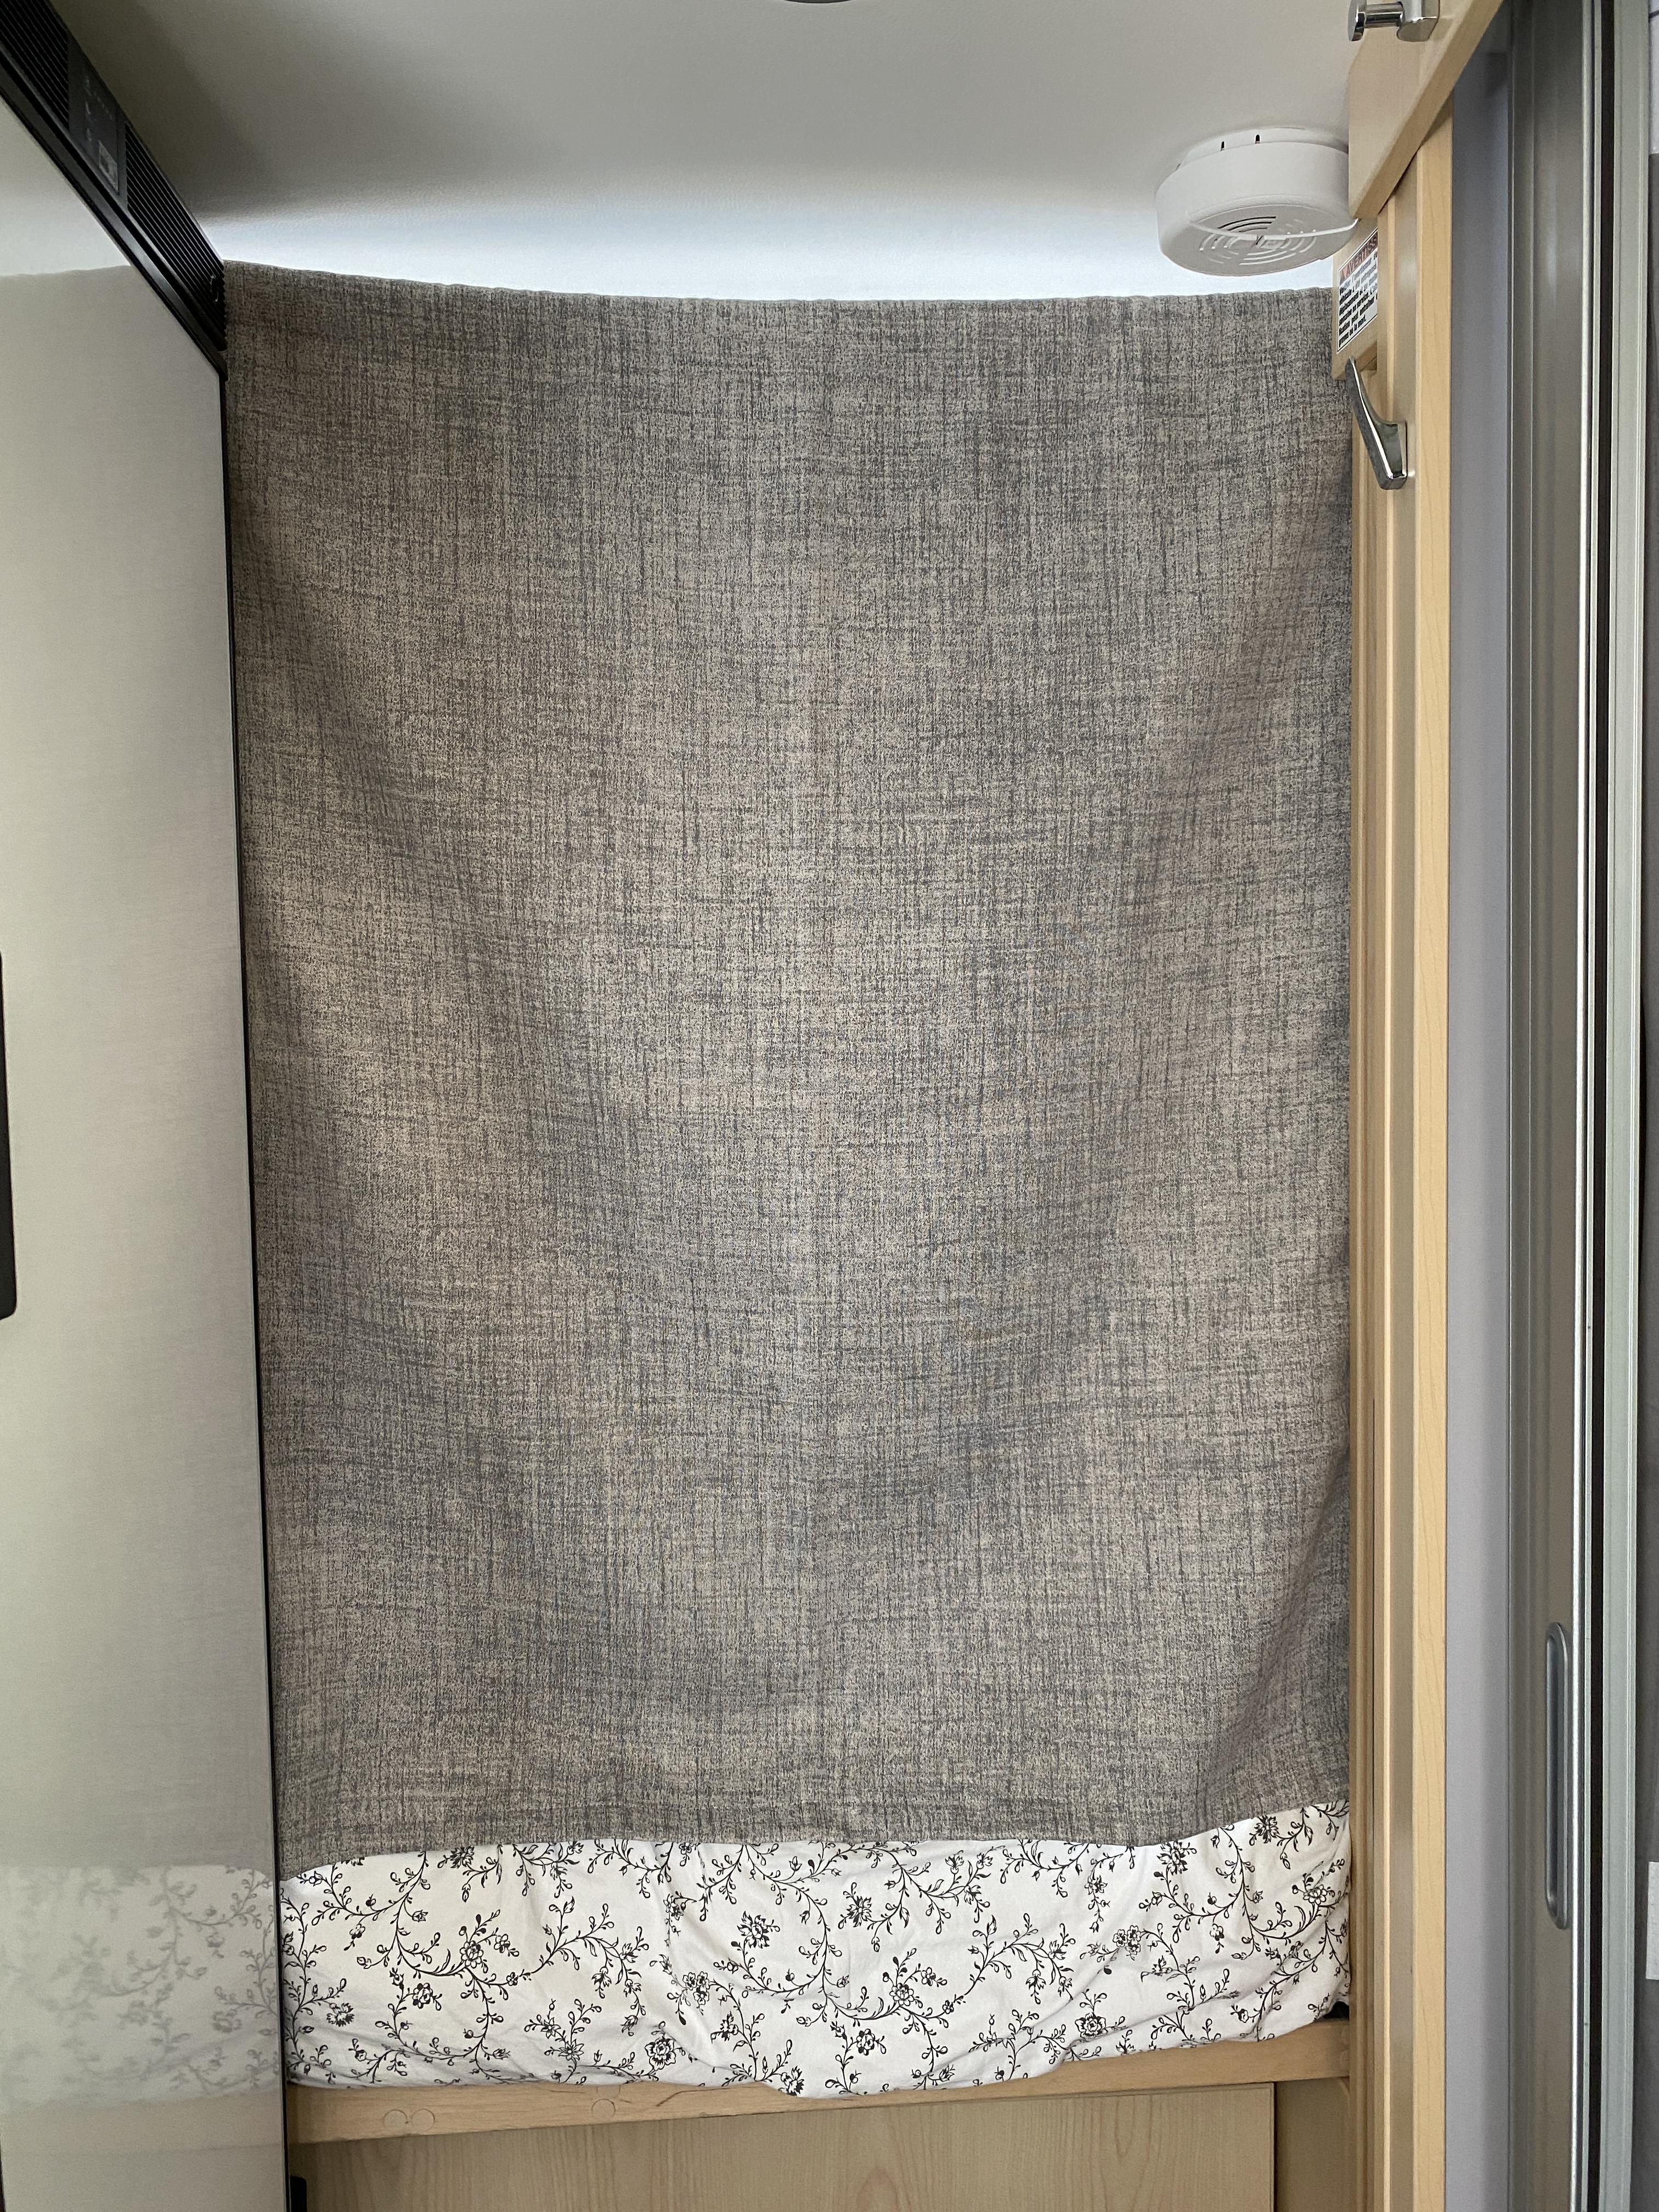 Panoramic RV - Rear privacy curtain #1